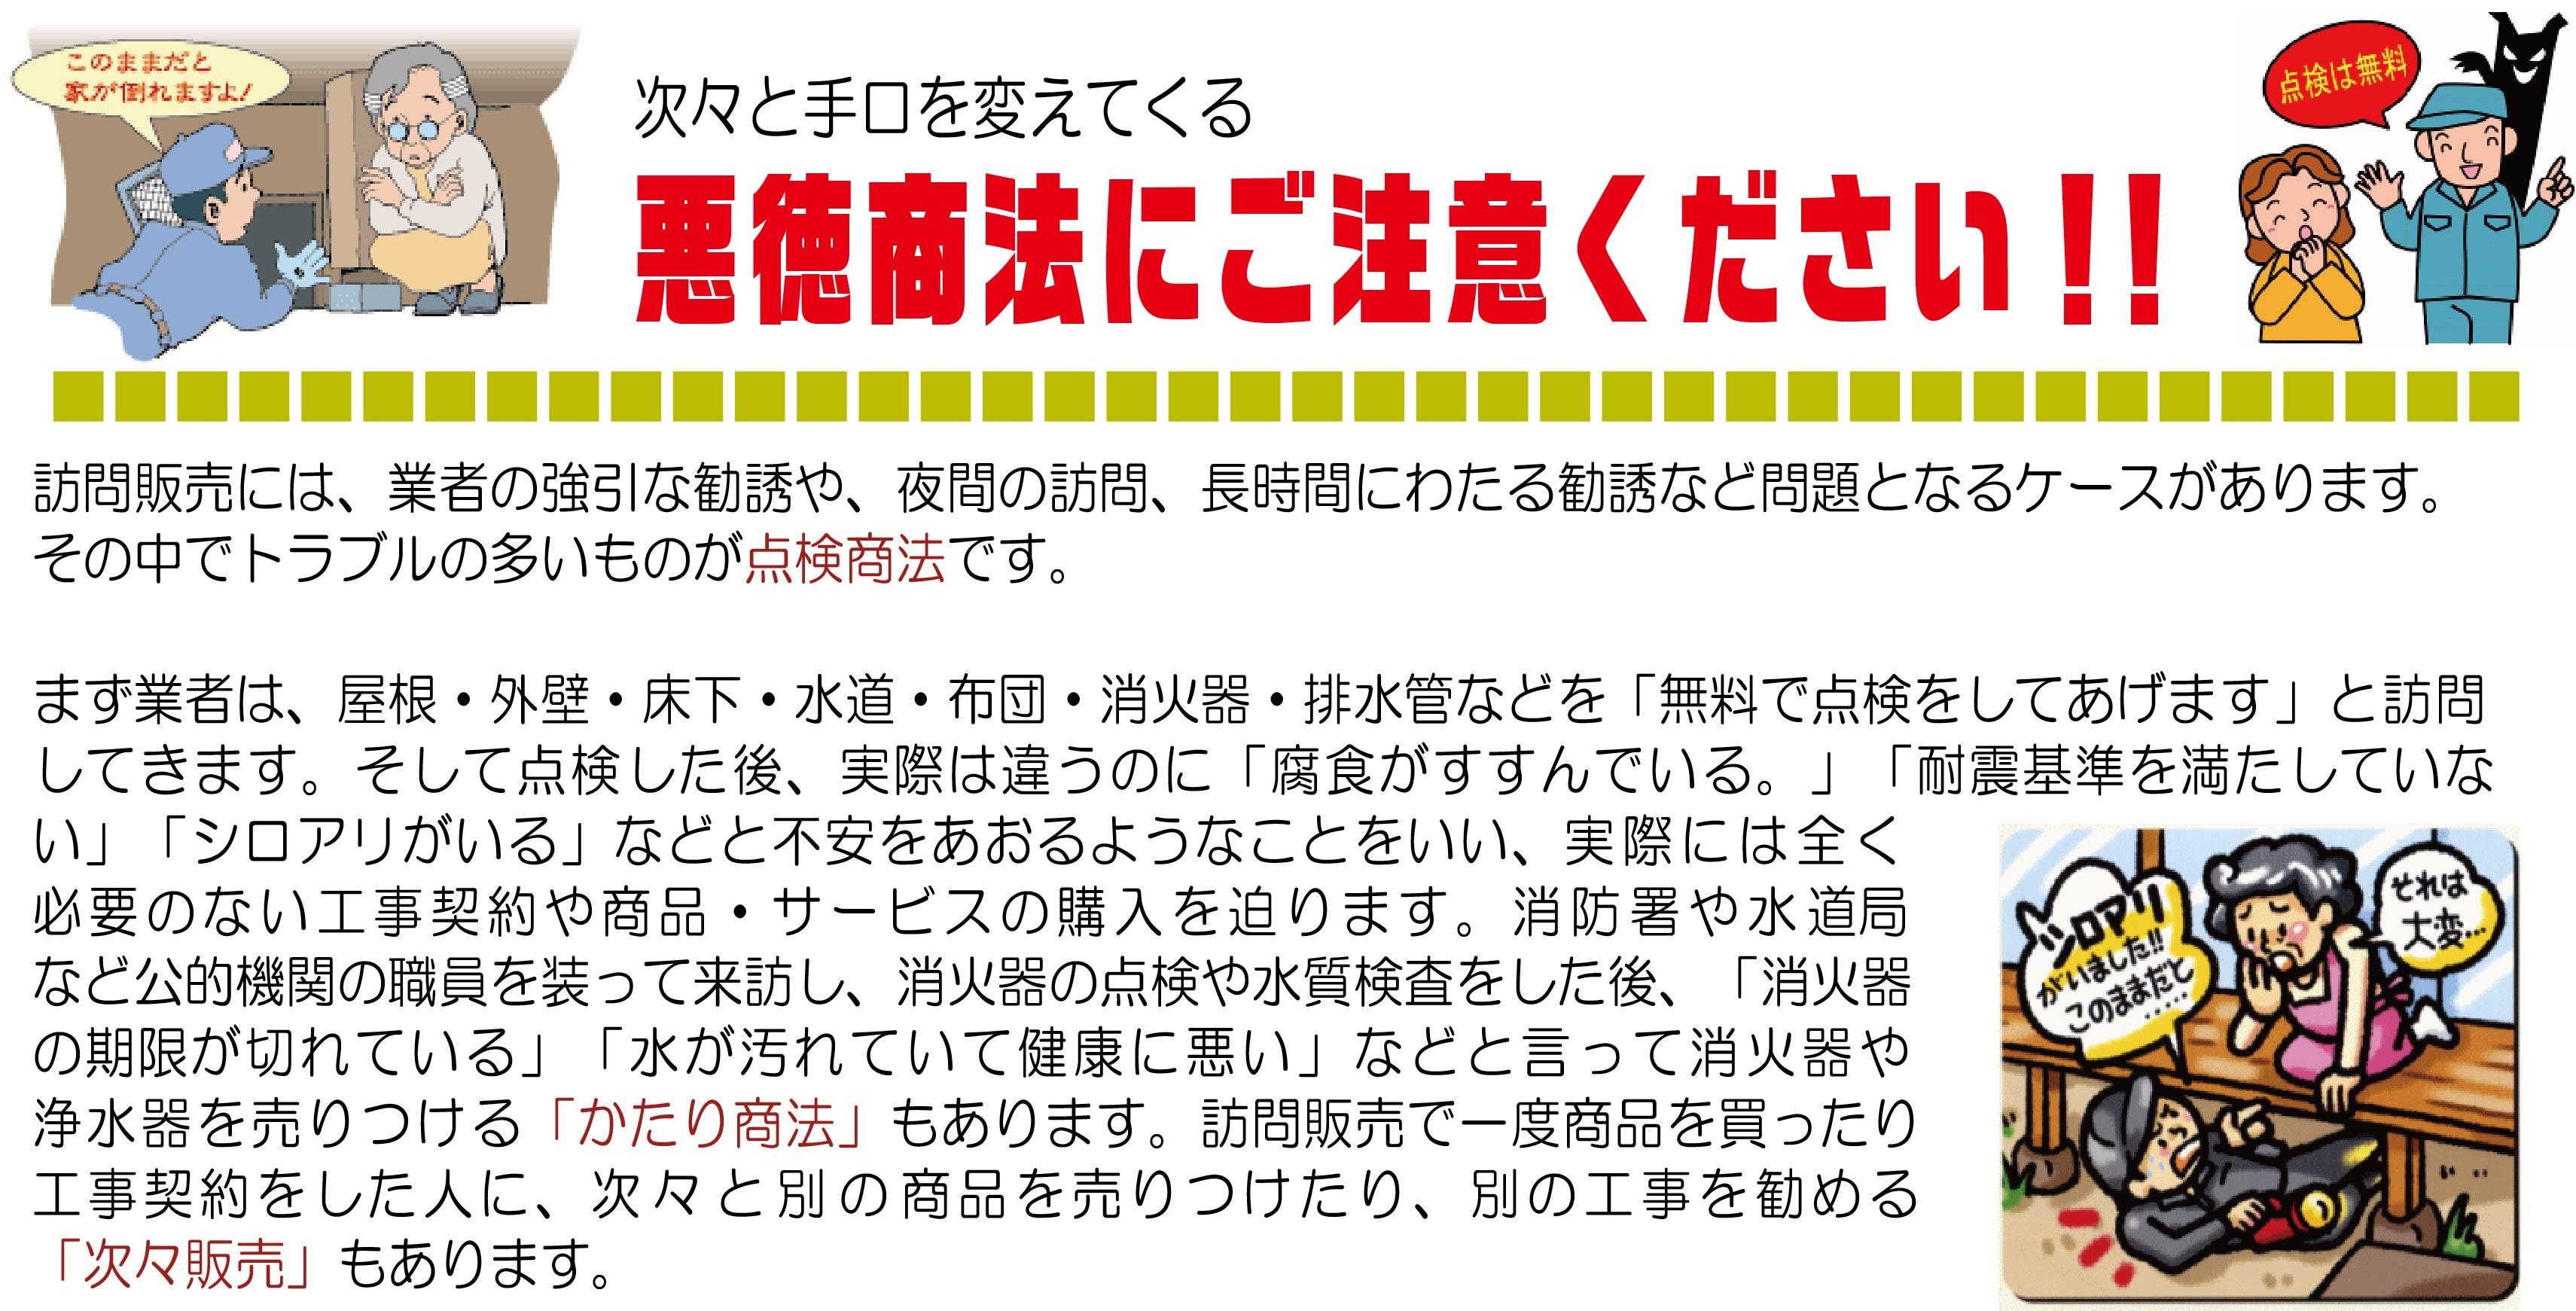 KuraSi-natu-sin84-13.jpg